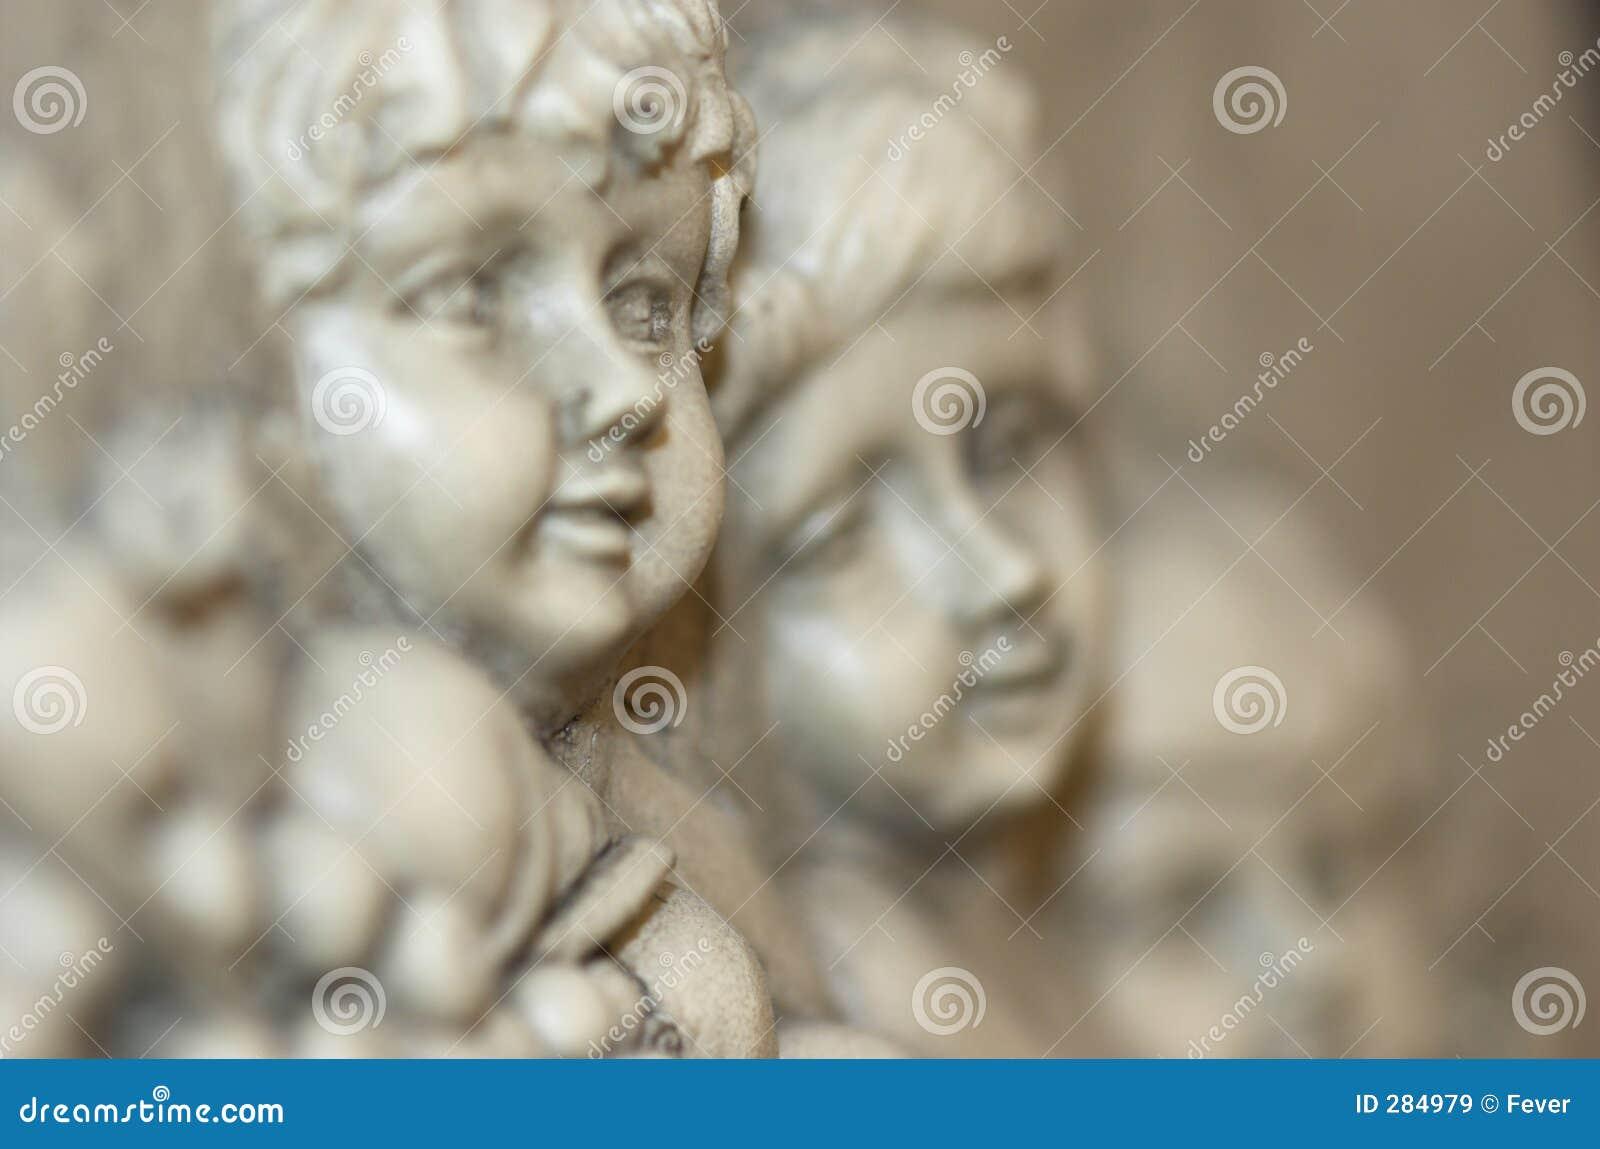 Cherubs Angels Clip Art – images free download